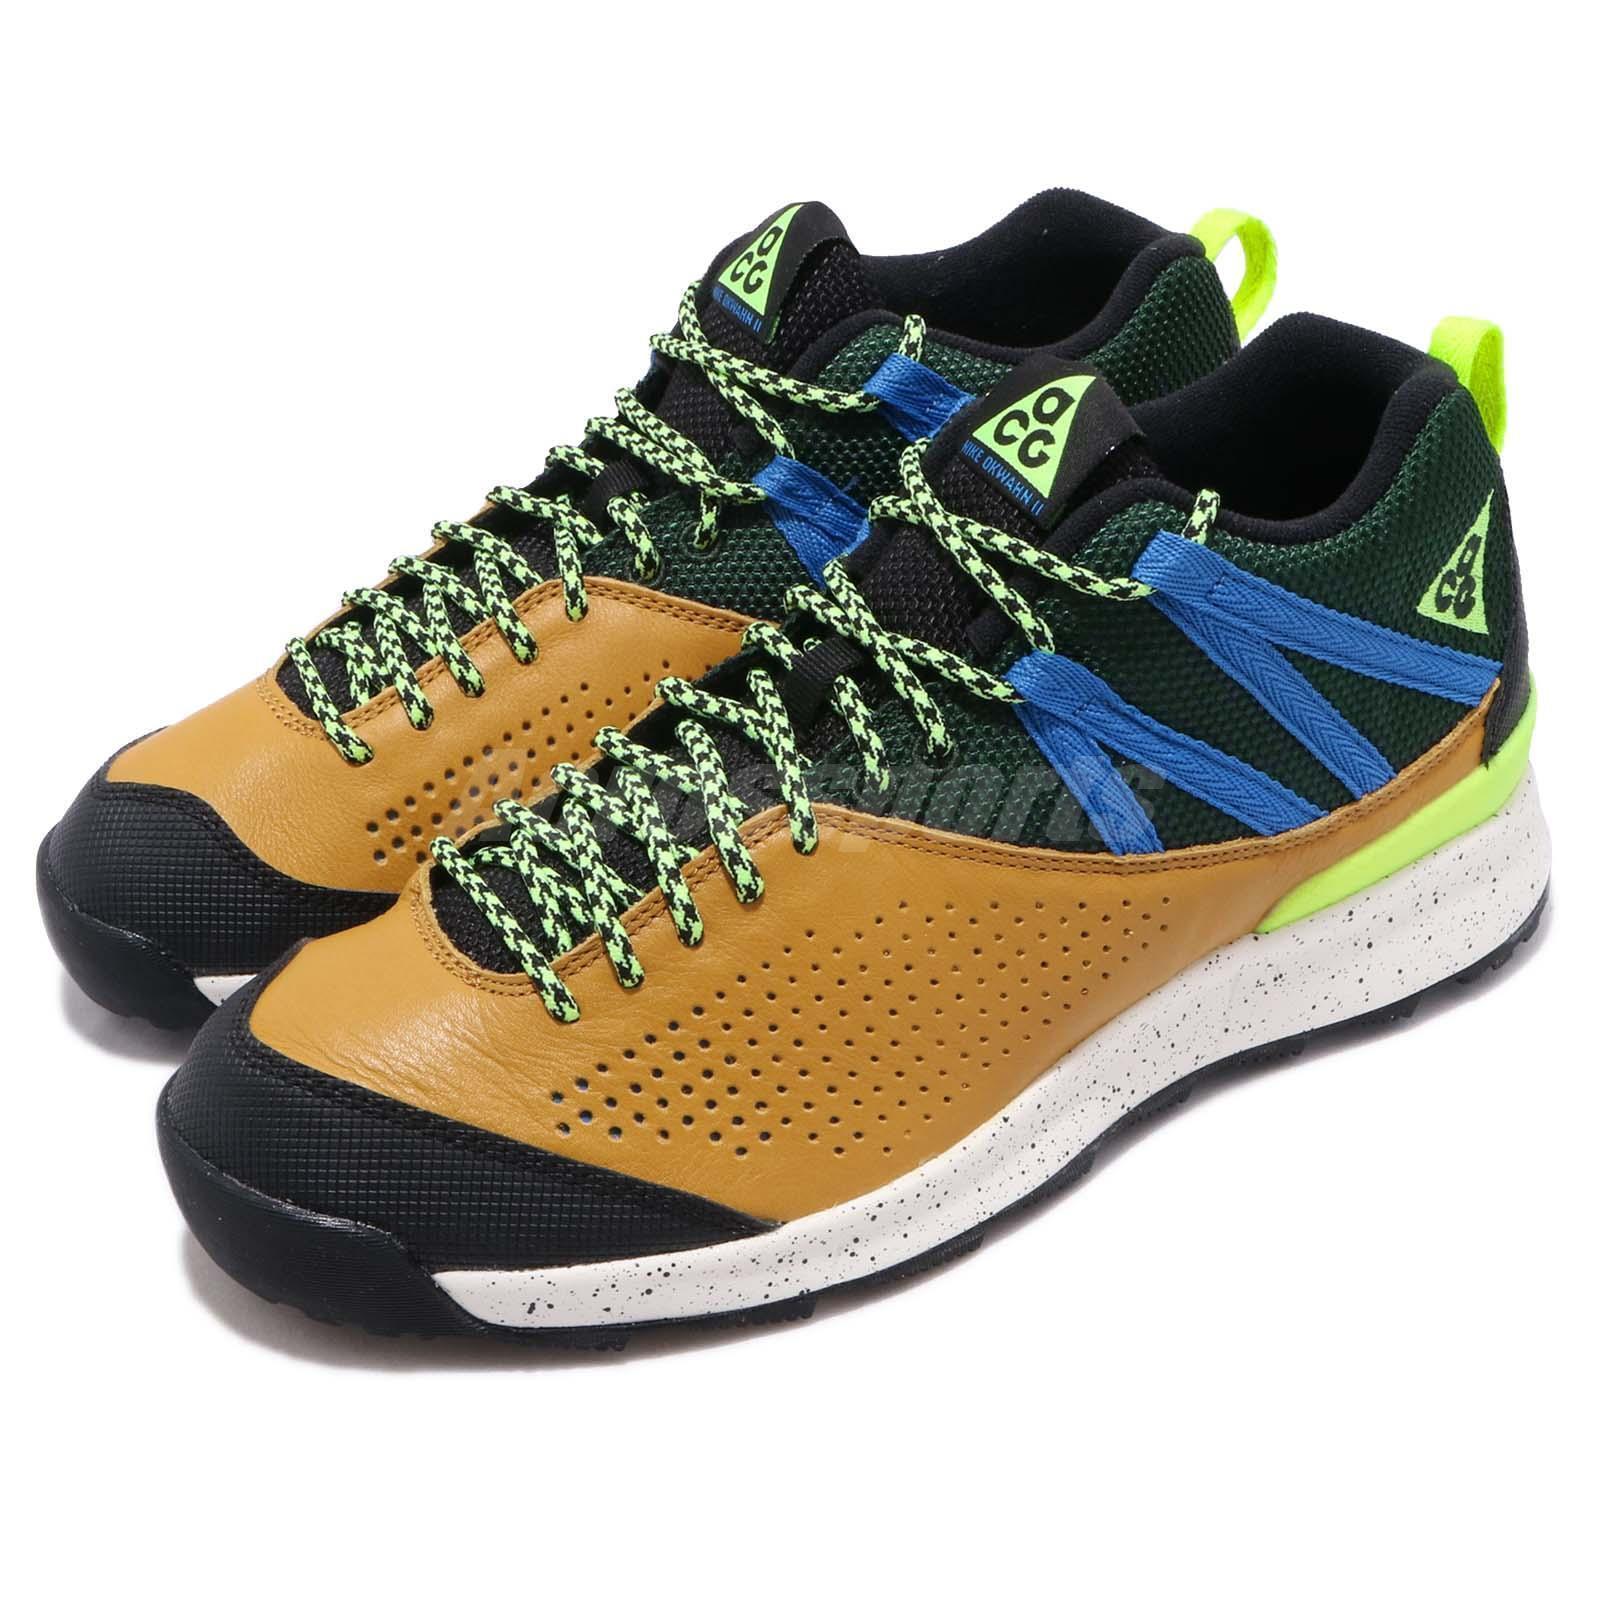 Nike ACG Okwahn II Dark  Citron Green Volt Glow Mens Outdoors shoes 525367-301  for cheap